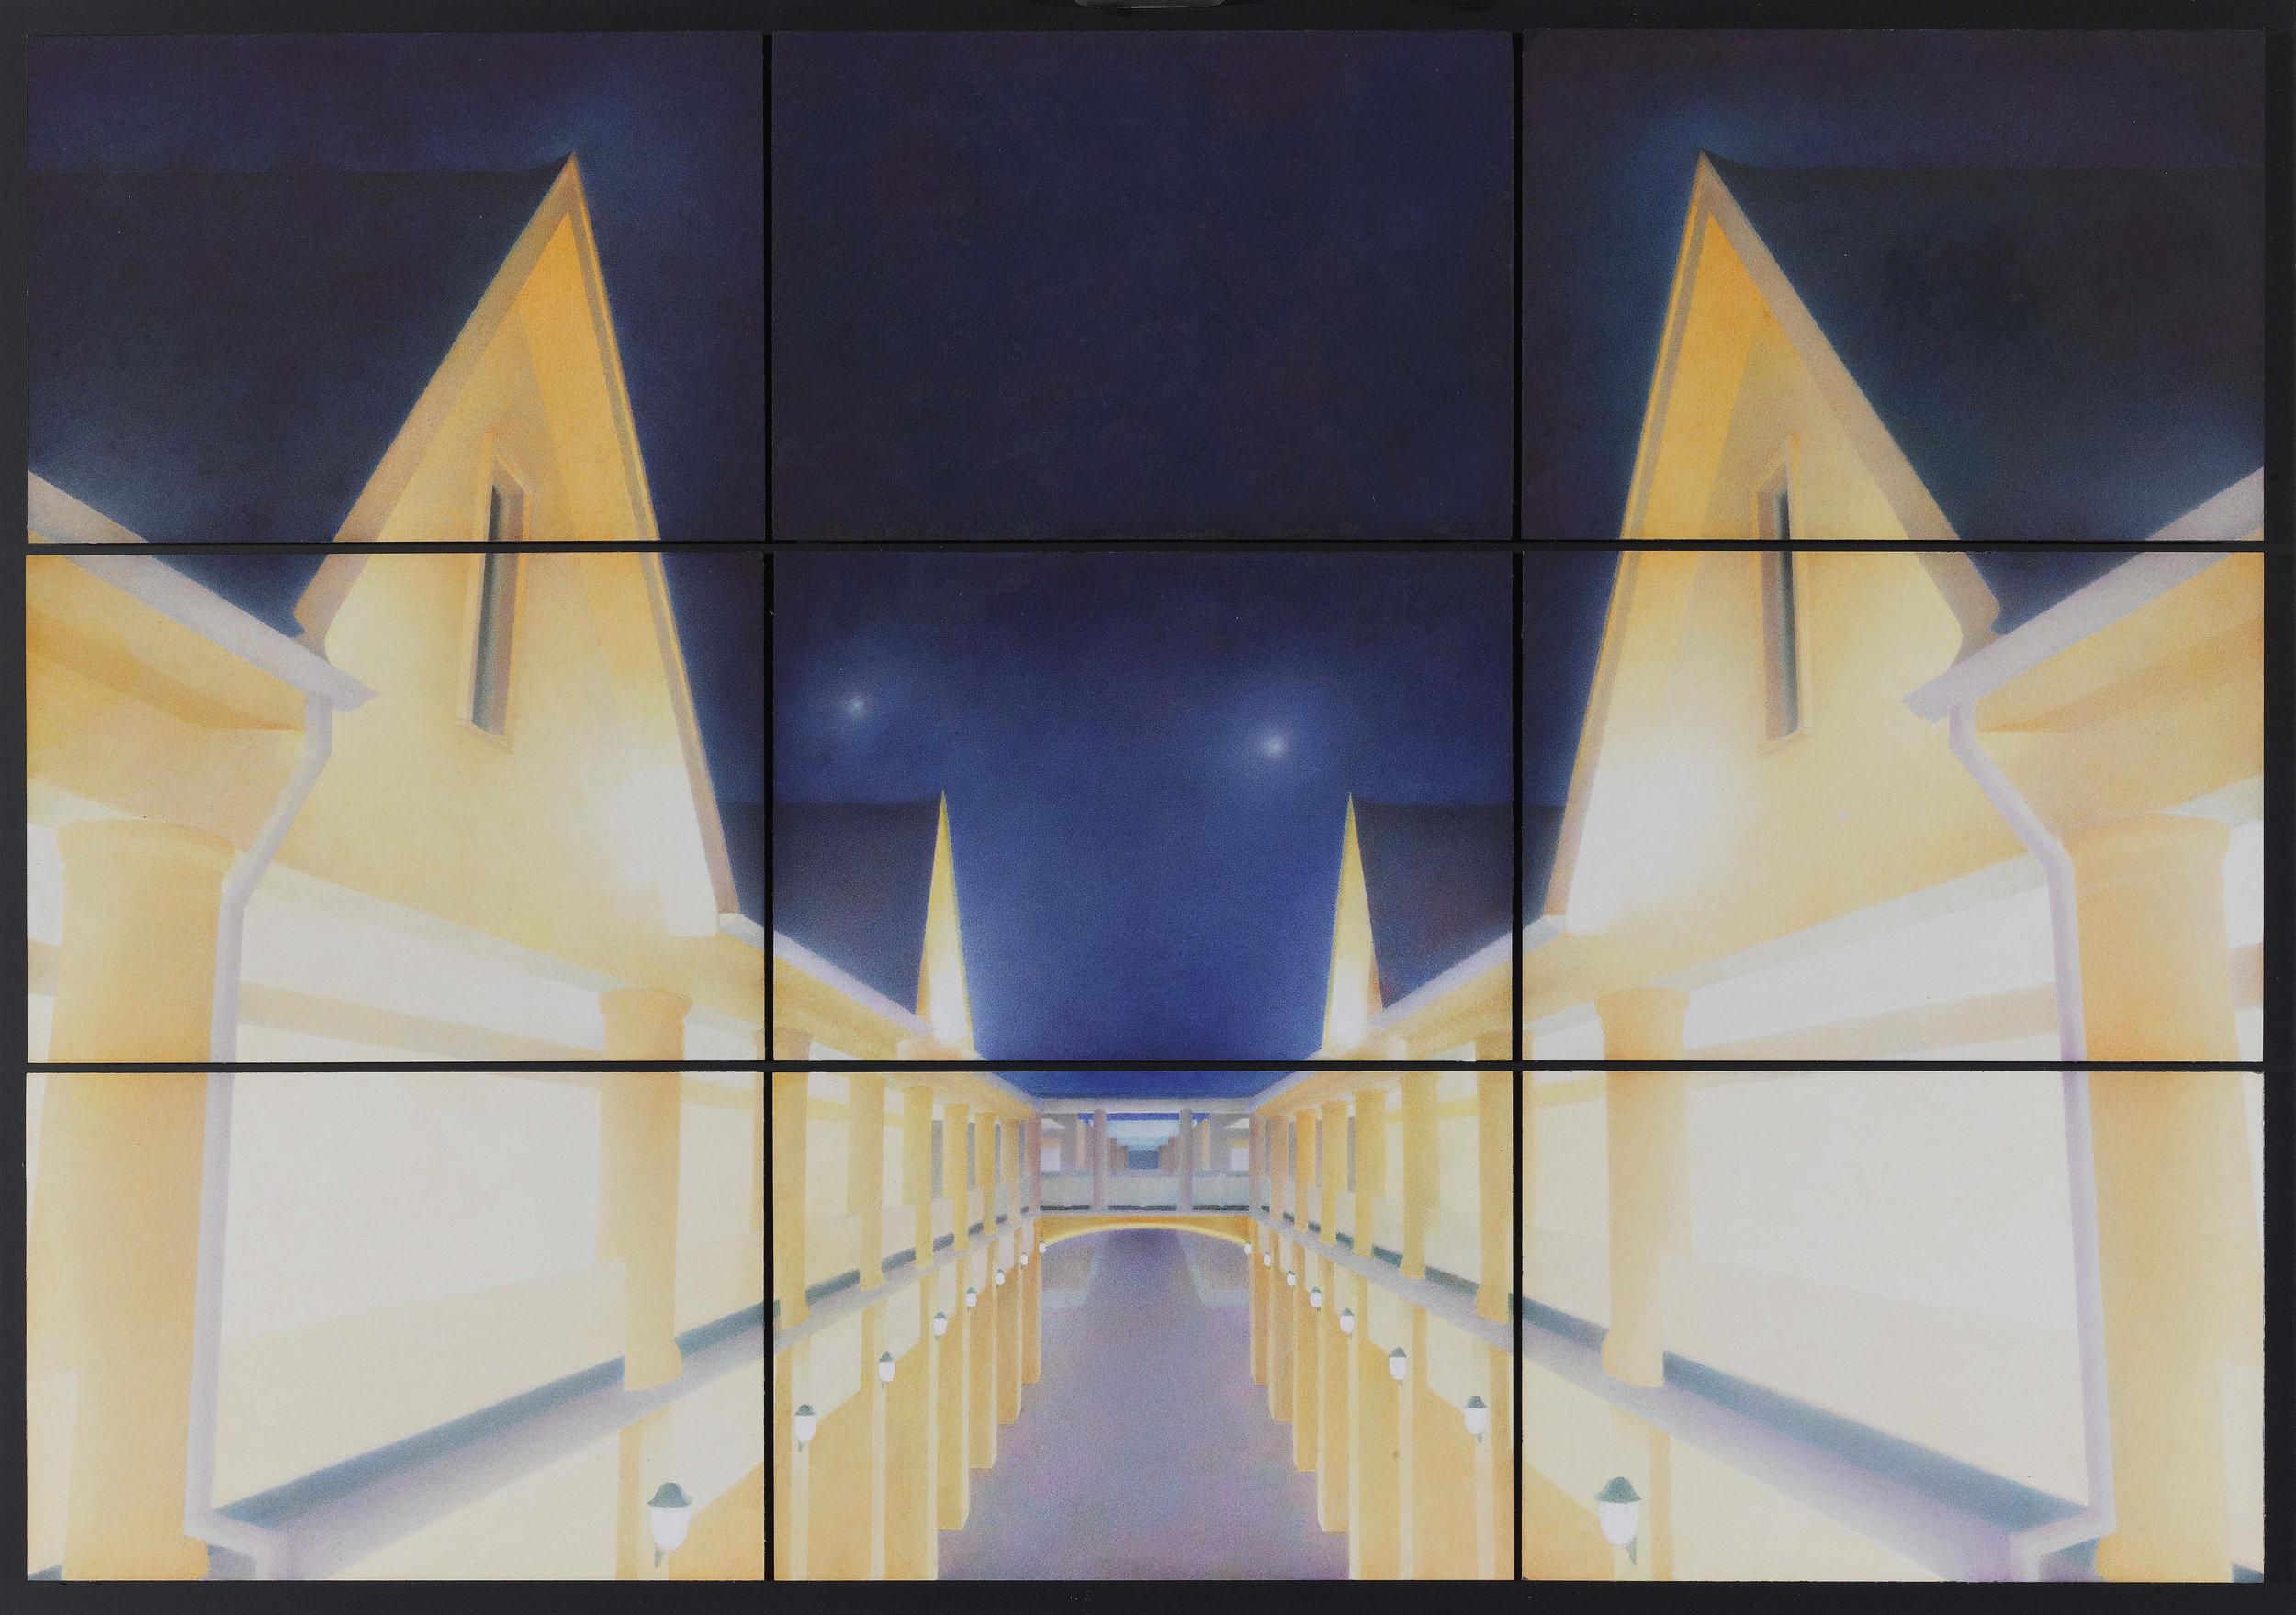 Liu Liu 刘流, Light, Air and Emotion 光、空气与情感, 2017, Watercolor on paper 纸上水彩, 54 x 78 cm